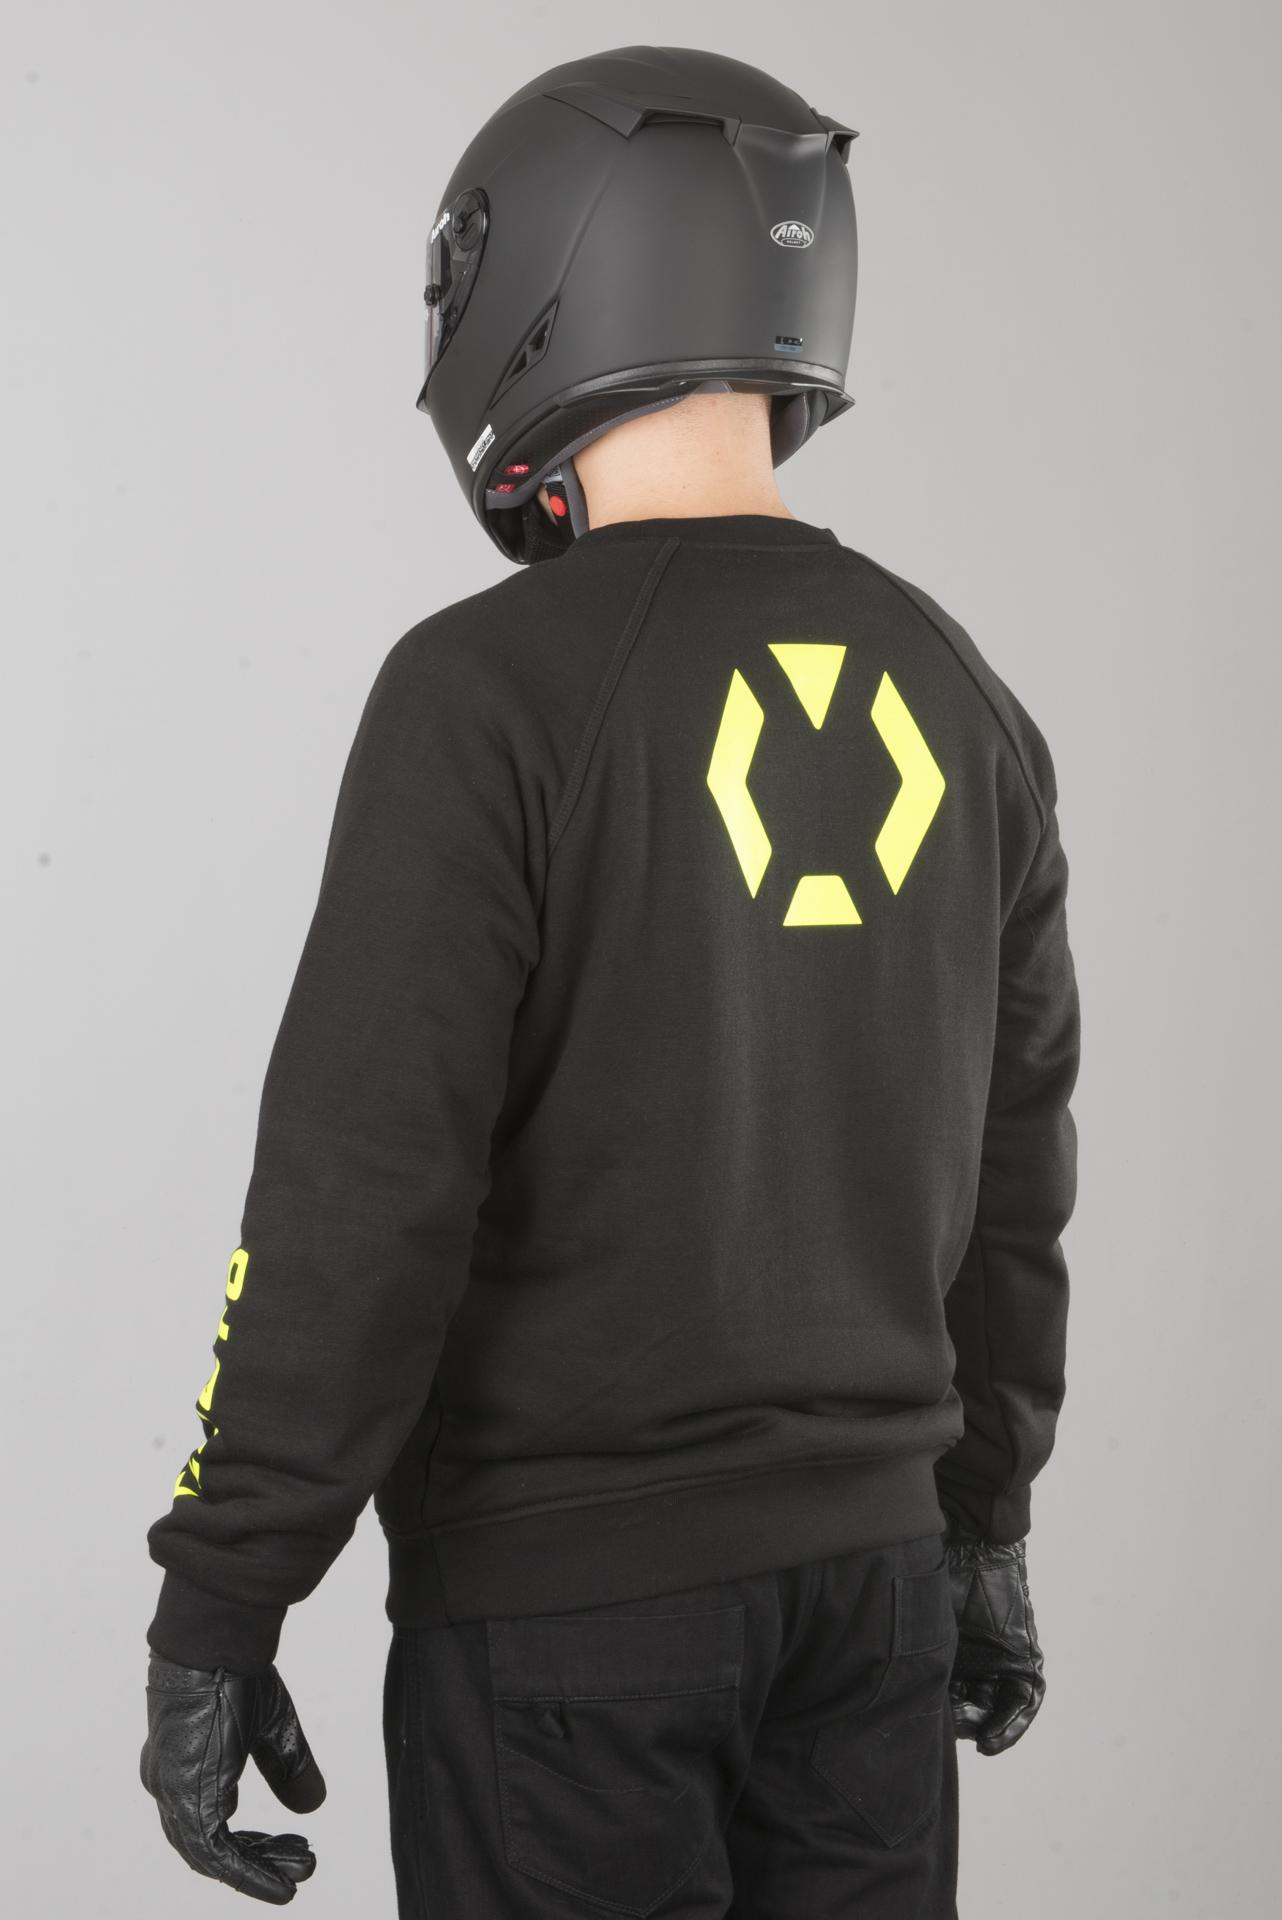 XLMOTO Motorrad Sweatshirt Aramidverstärkt Schwarz Gelb